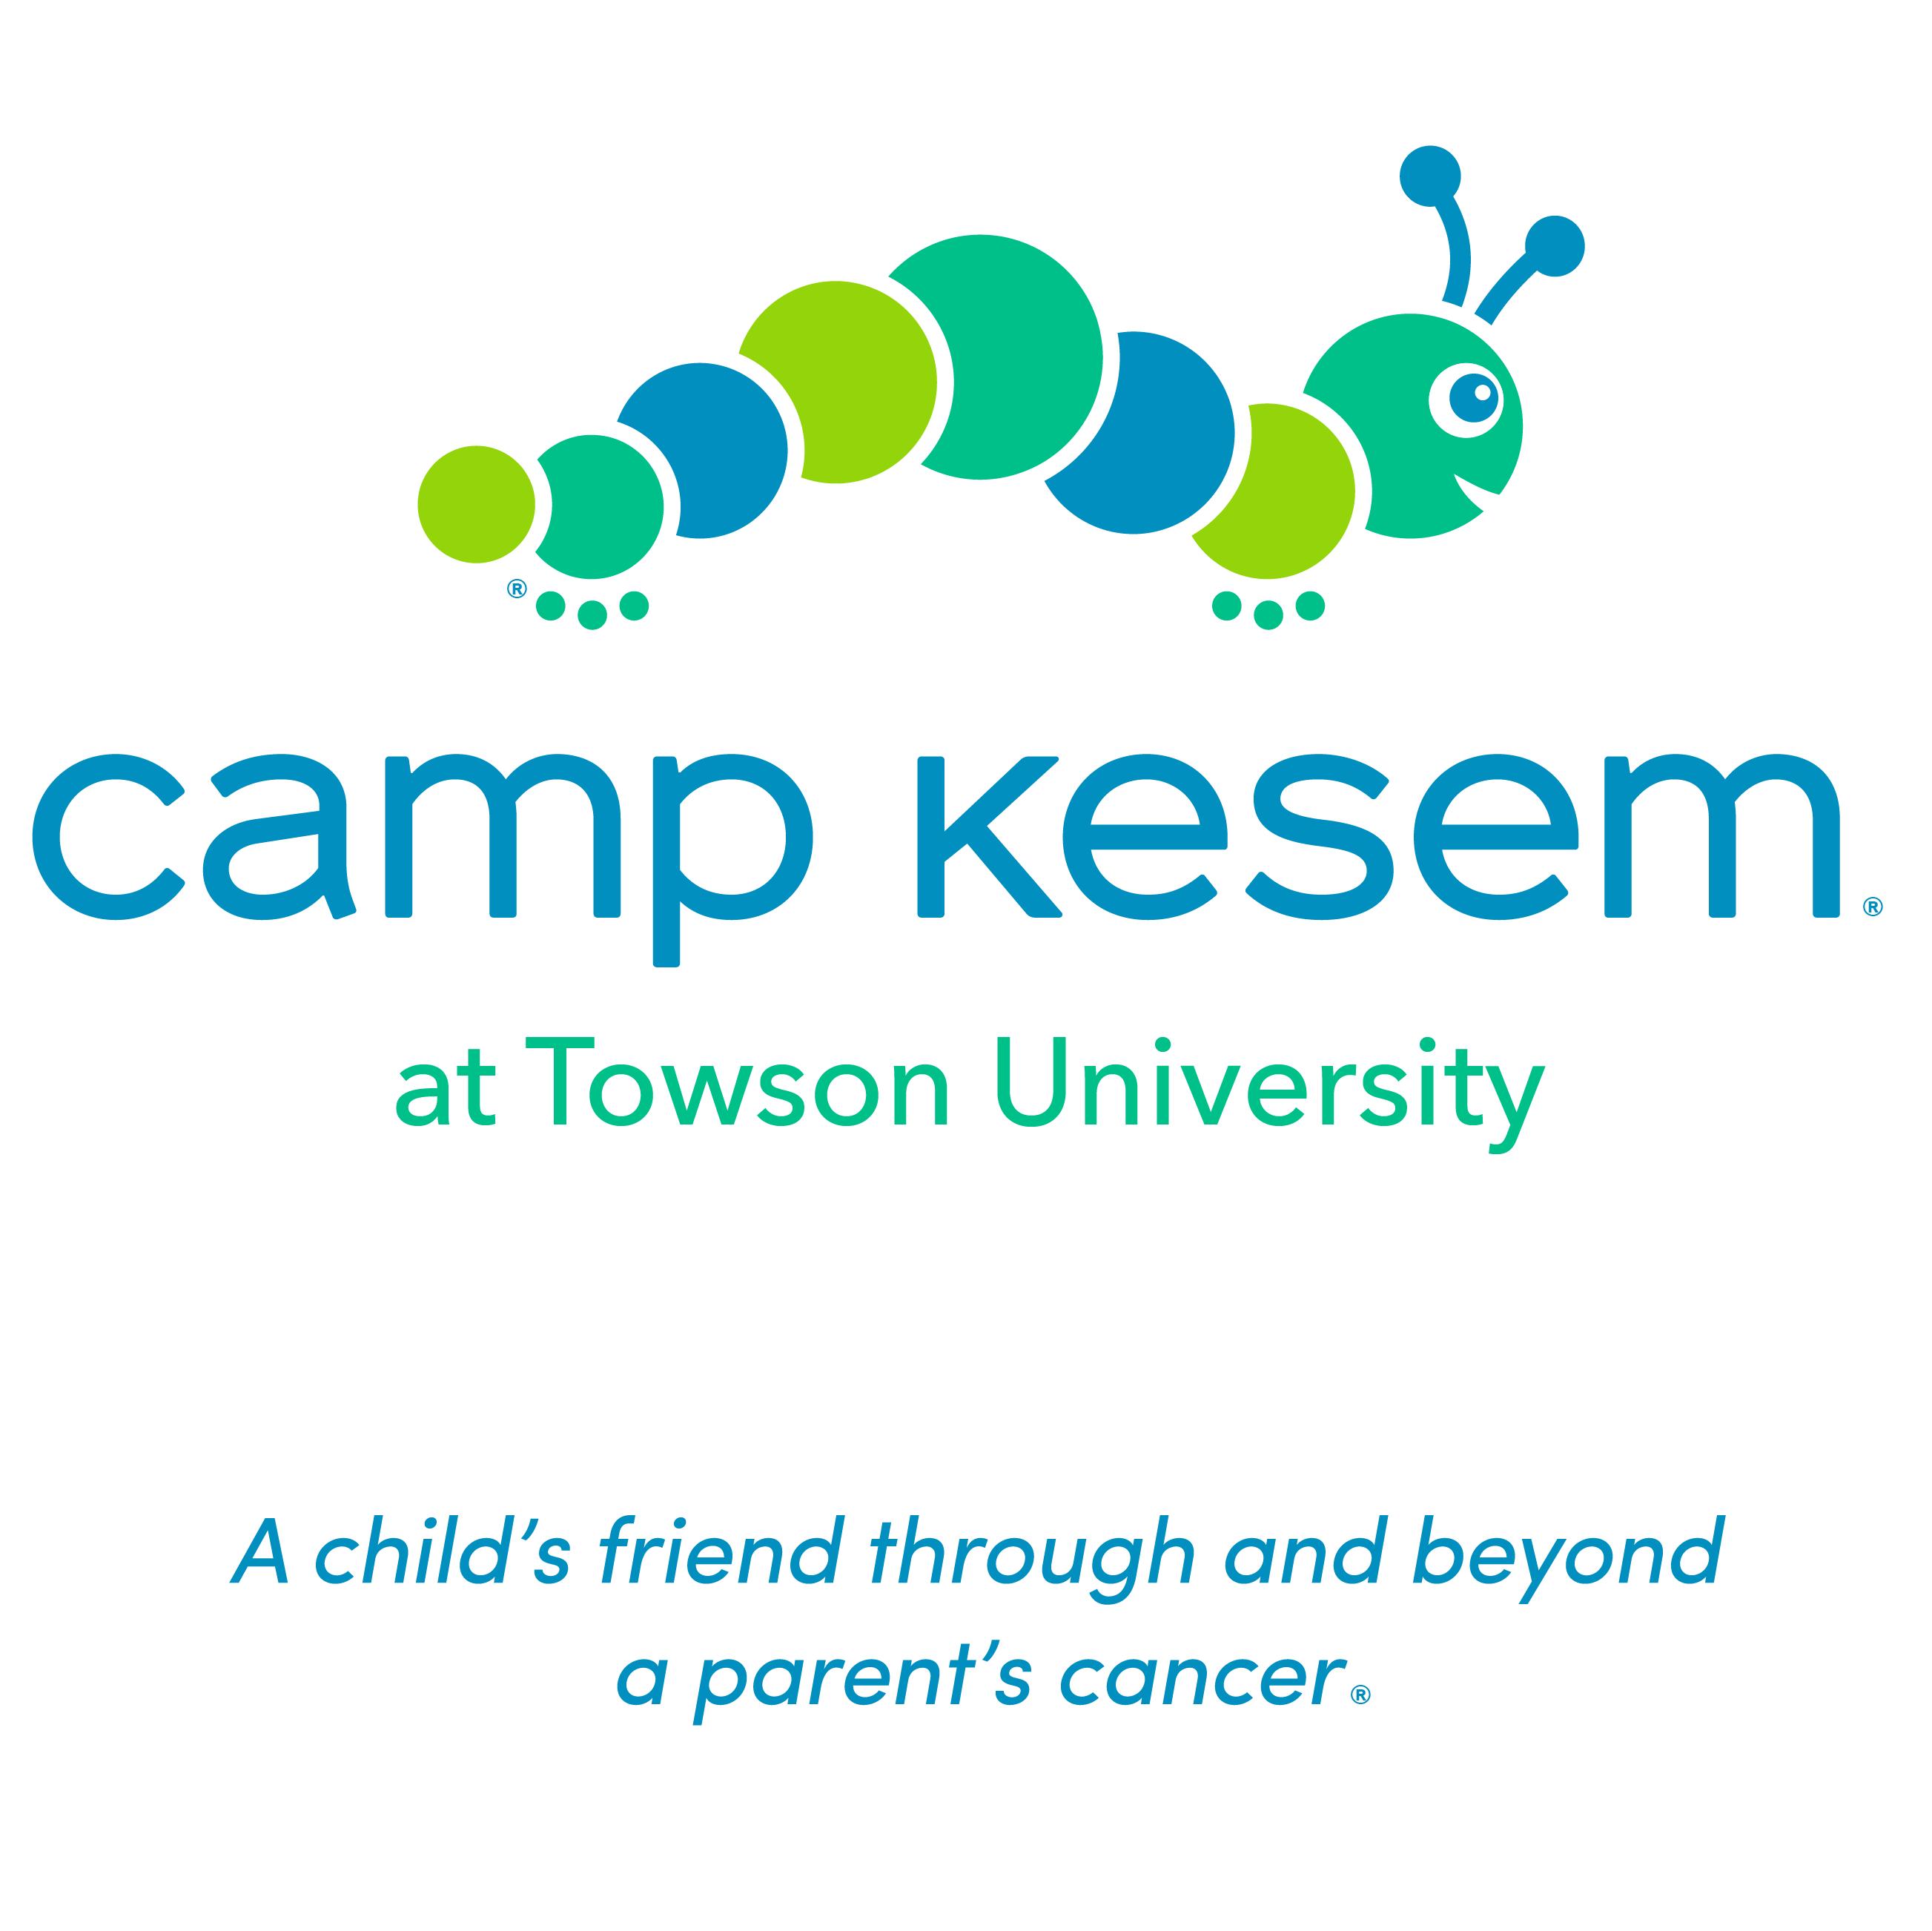 Camp Kesem at Towson University